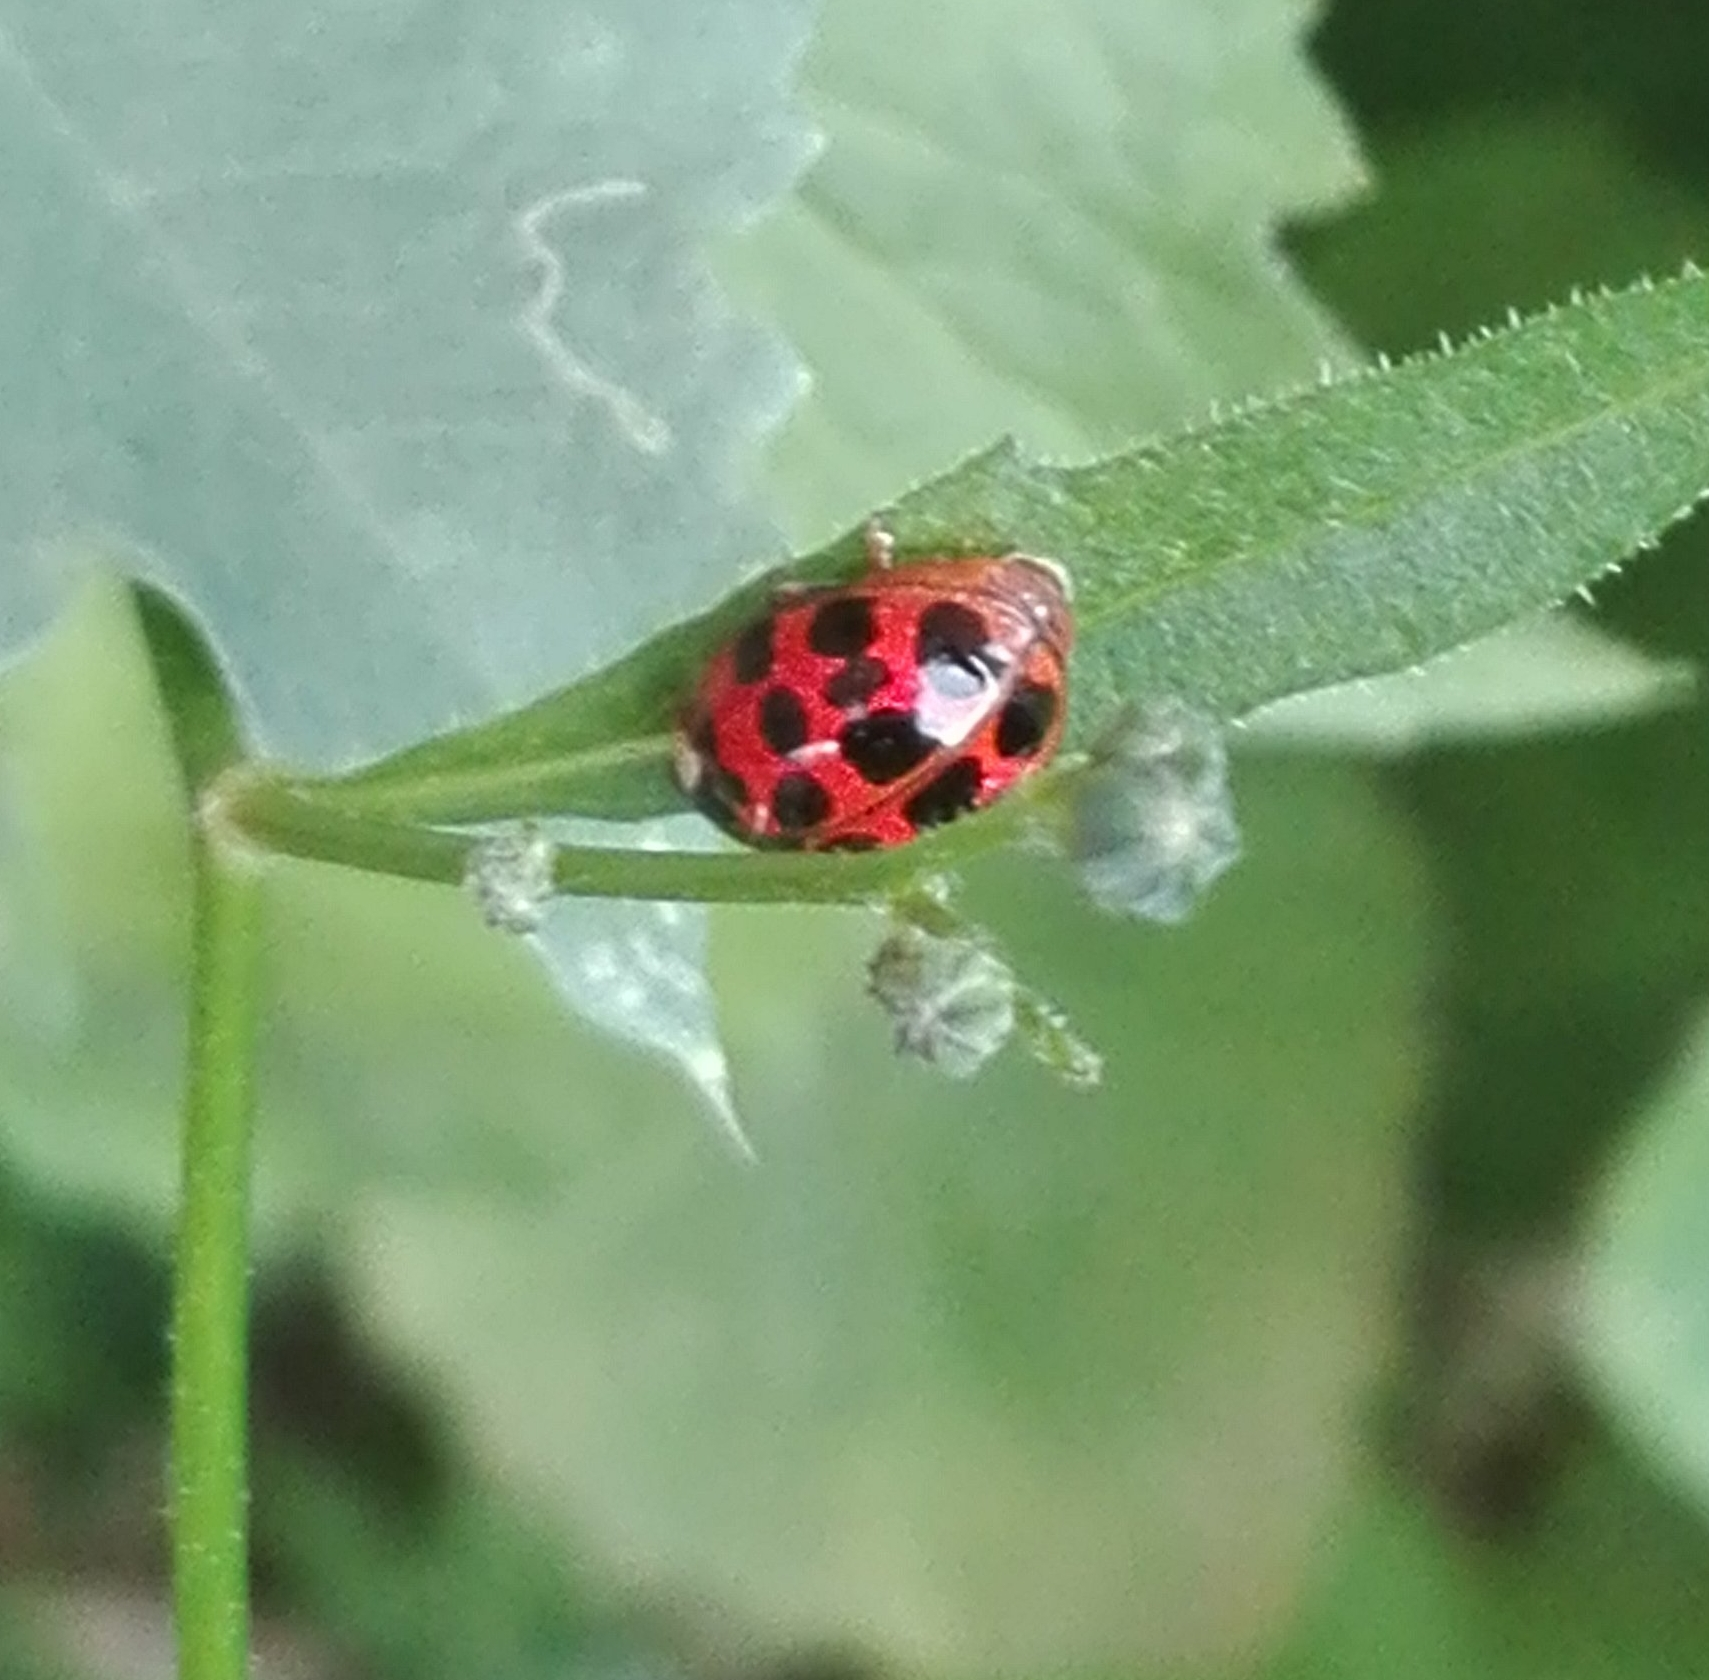 #124 Harlequin Ladybird